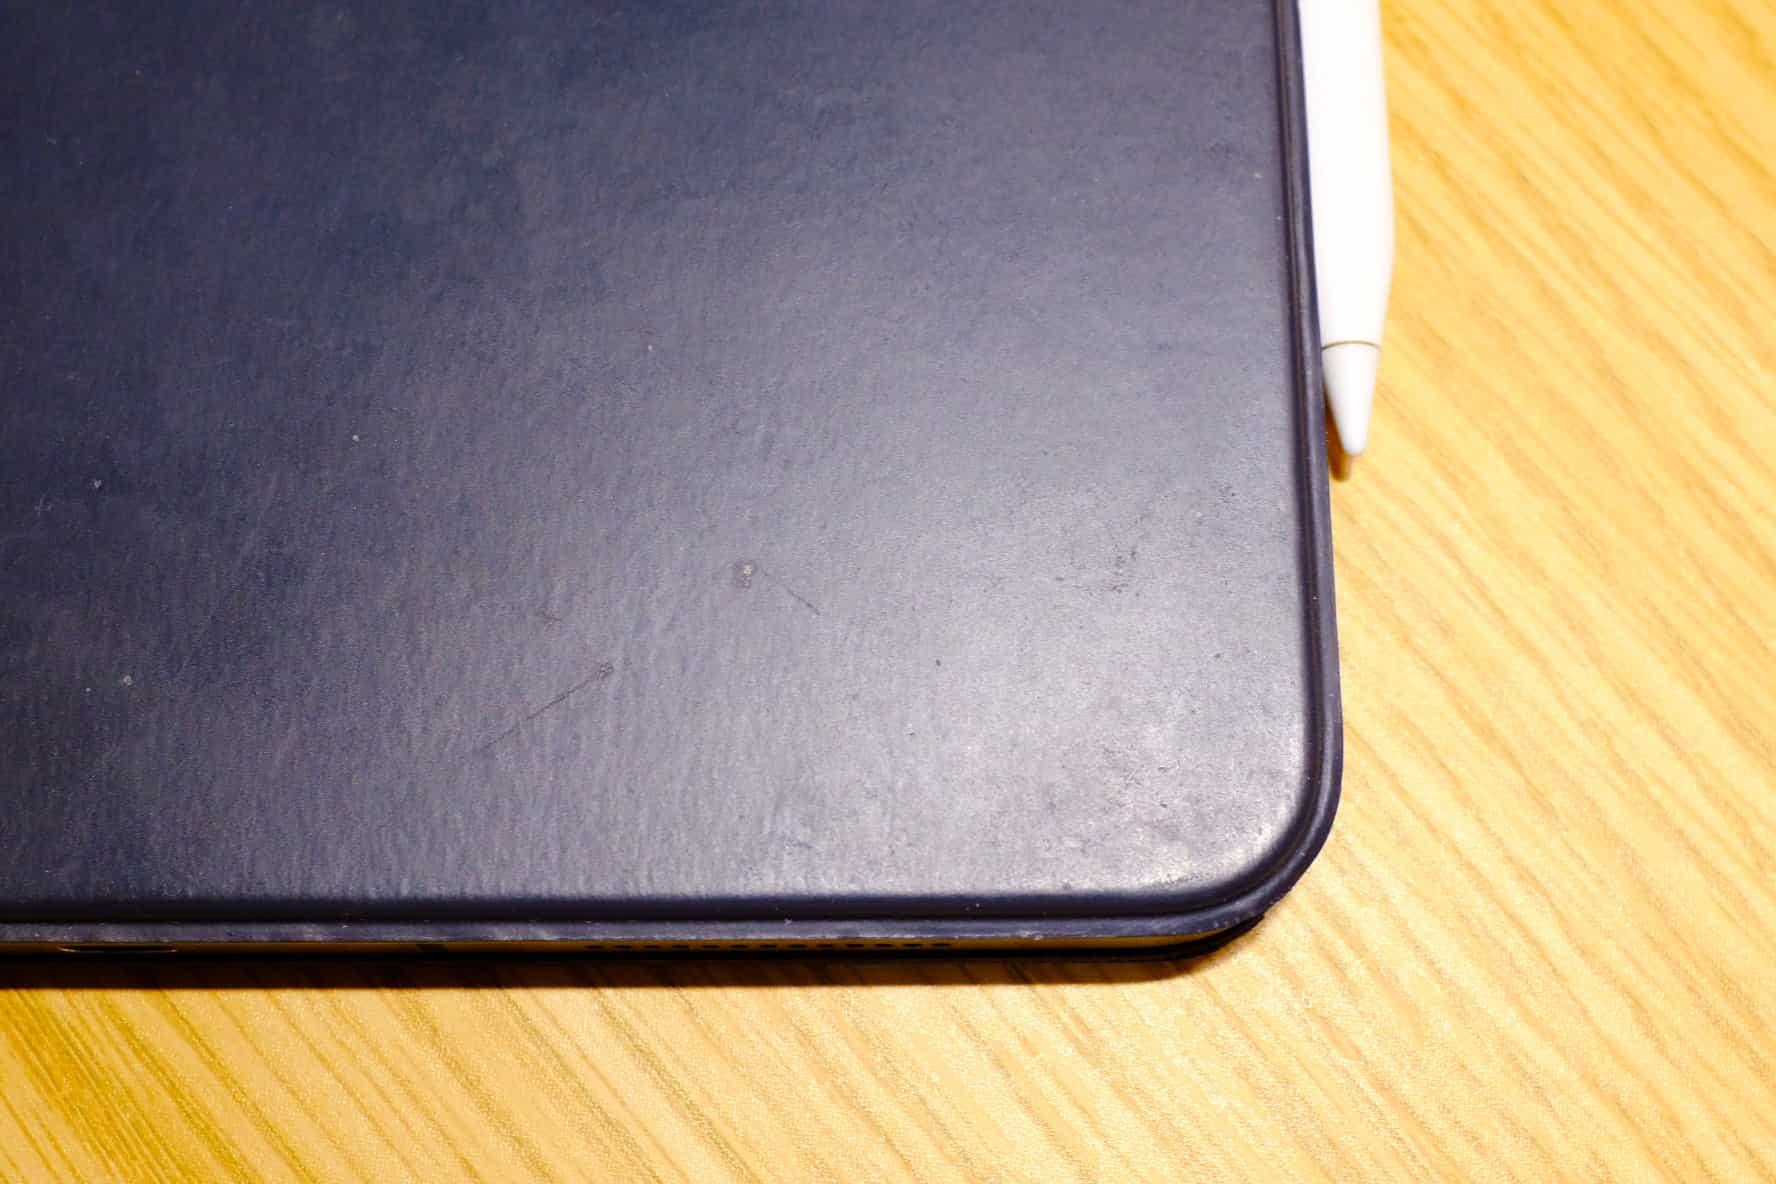 「Smart Keyboard Folio」がケースにもなるけど、さらにケースを用意した方がいい?